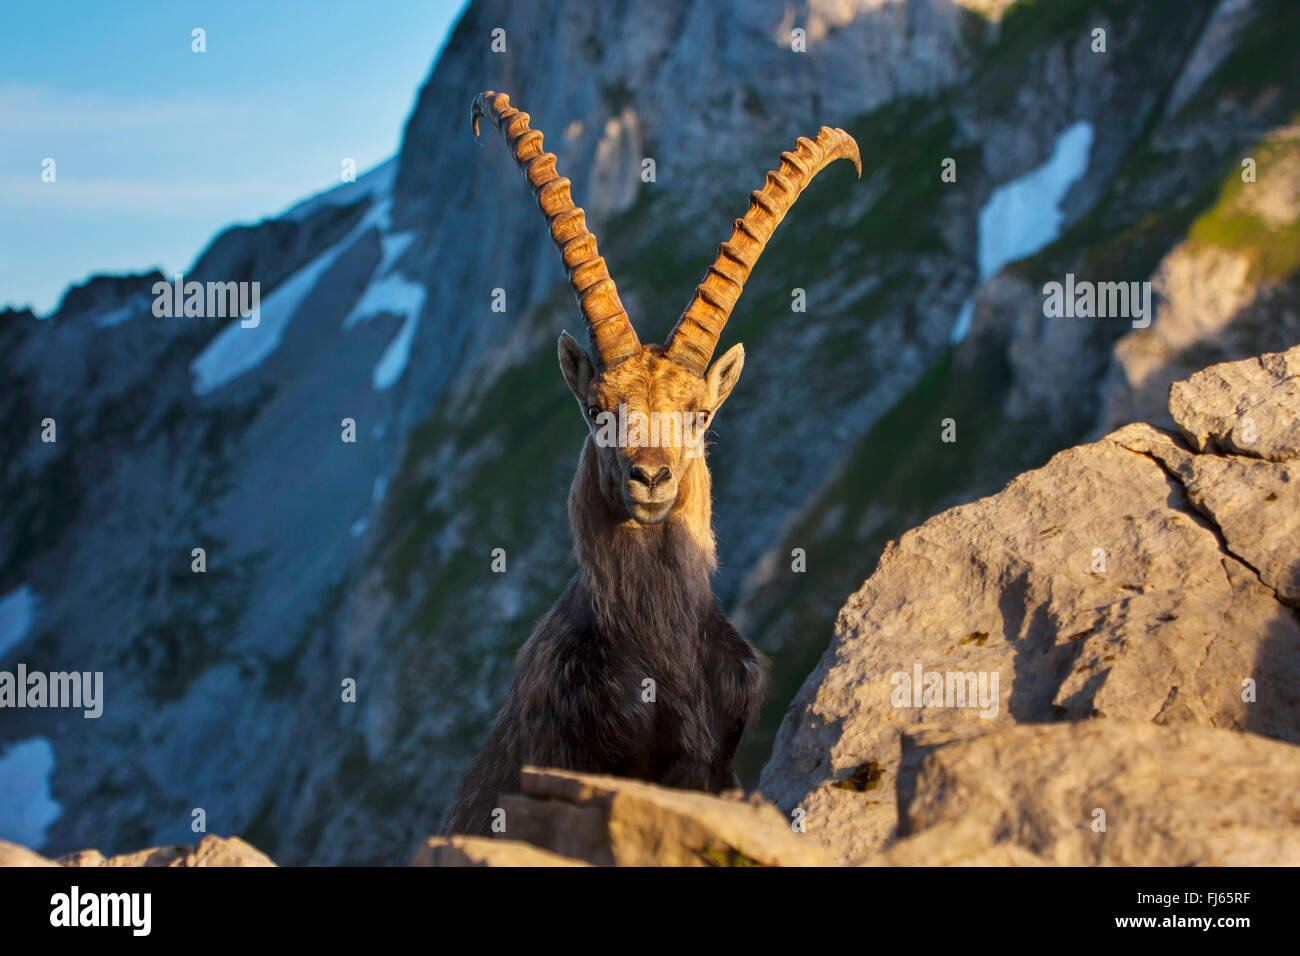 Alpina (Capra ibex, Capra ibex ibex), a la luz de la mañana delante de un telón de fondo de montañas, Imagen De Stock